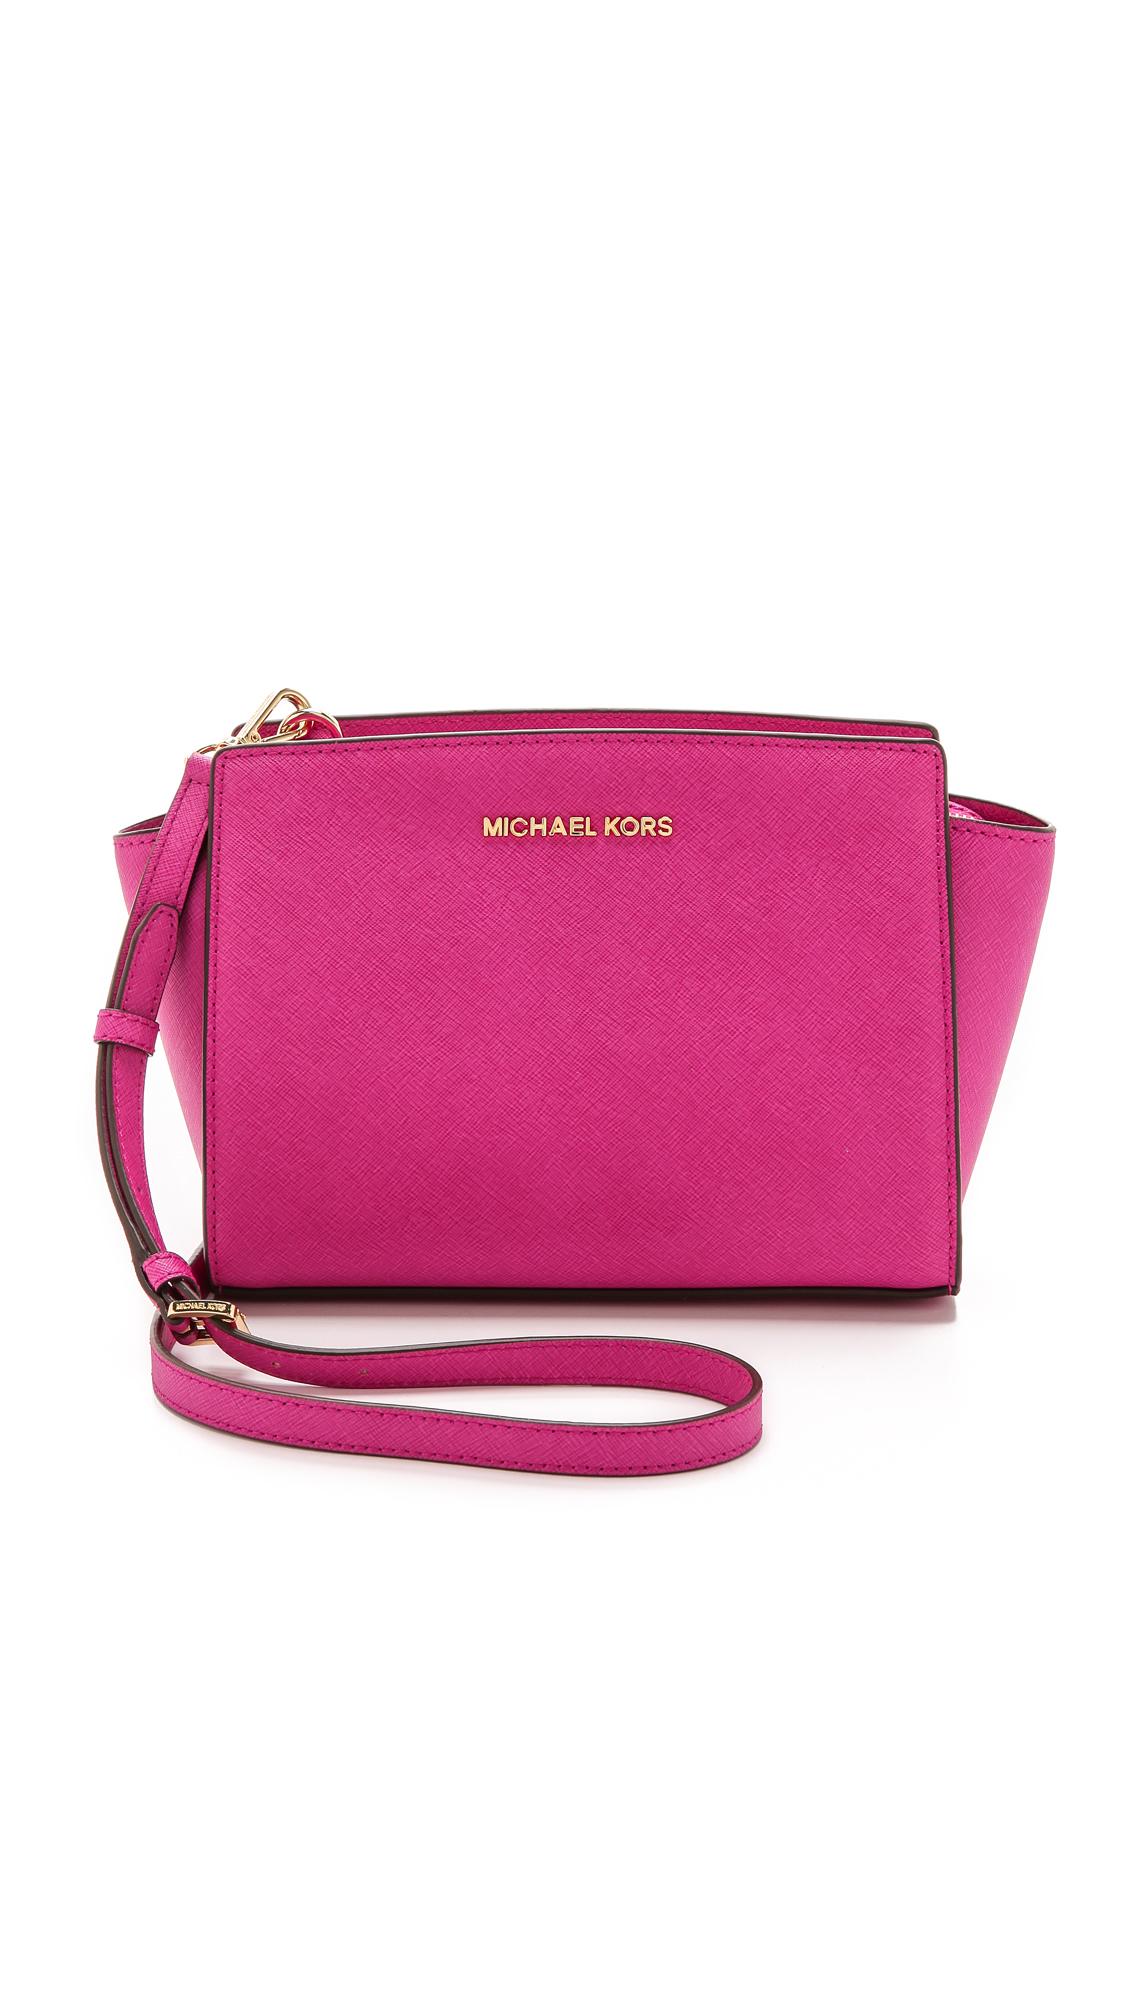 Michael Kors Selma Medium Messenger Bag Shopbop Lilac Authentic